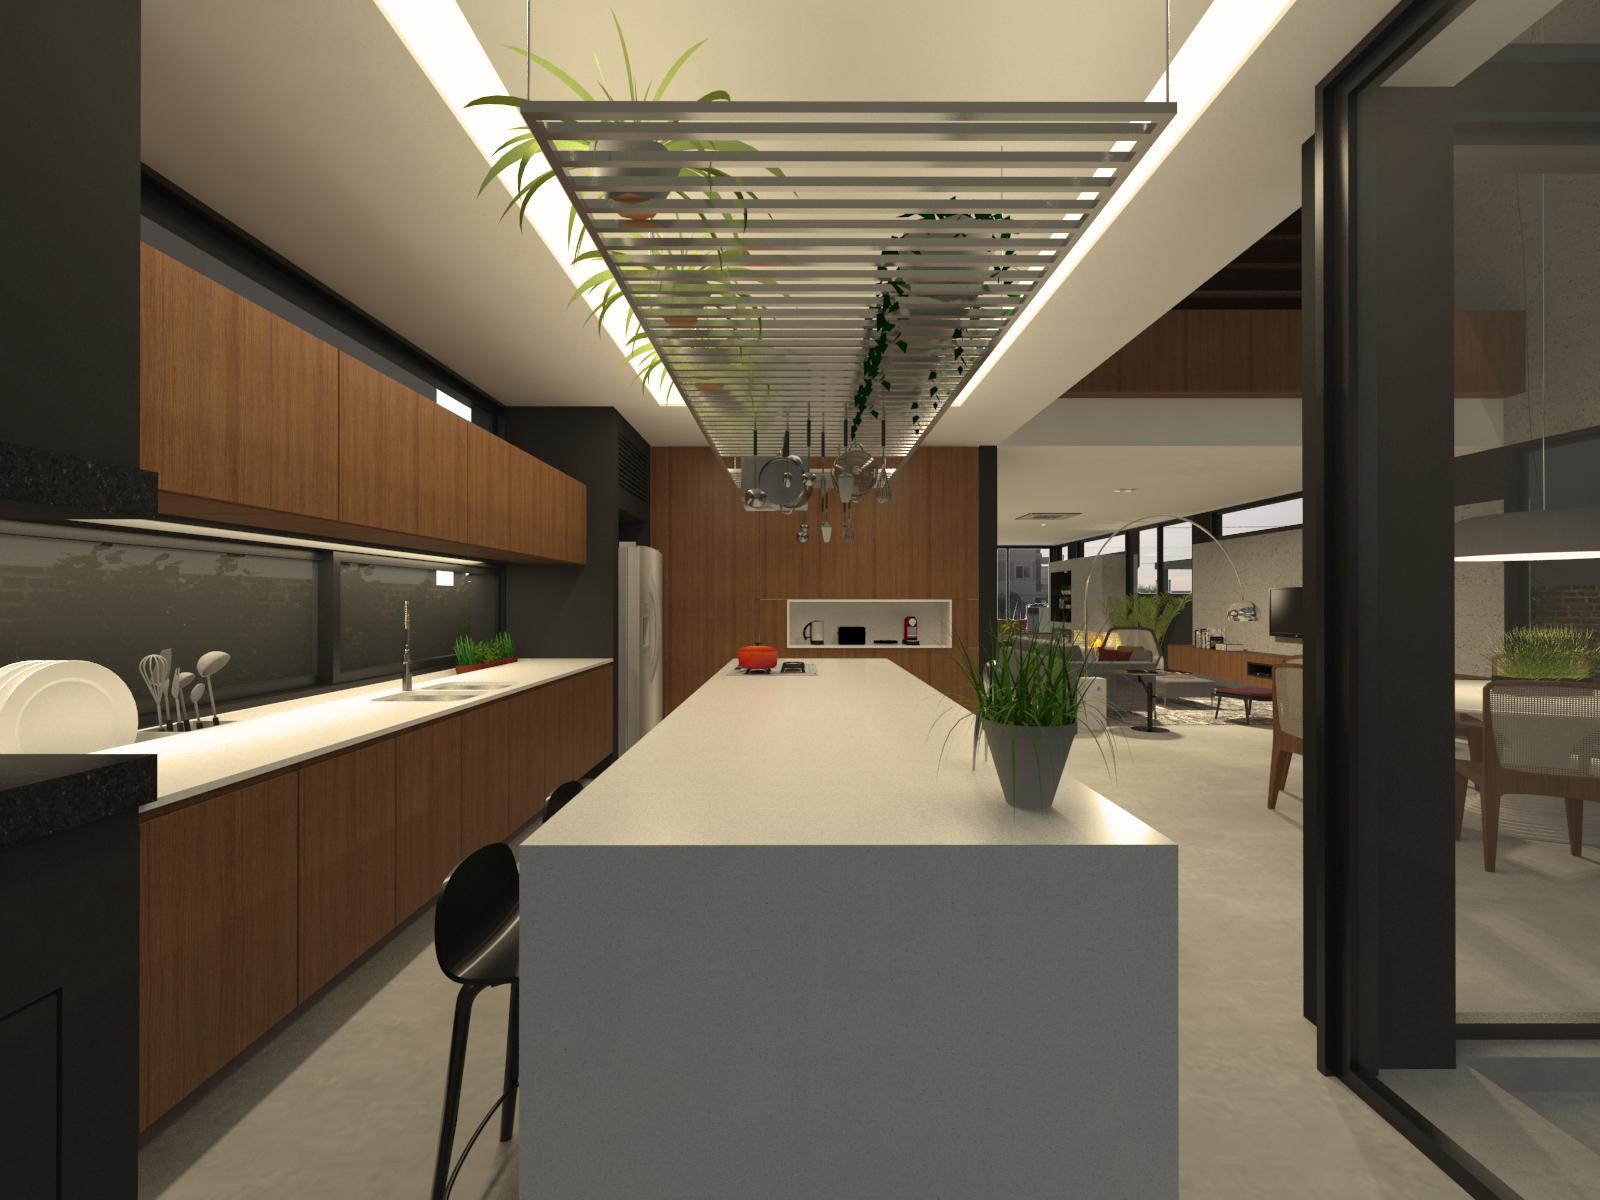 casa coracini | cozinha